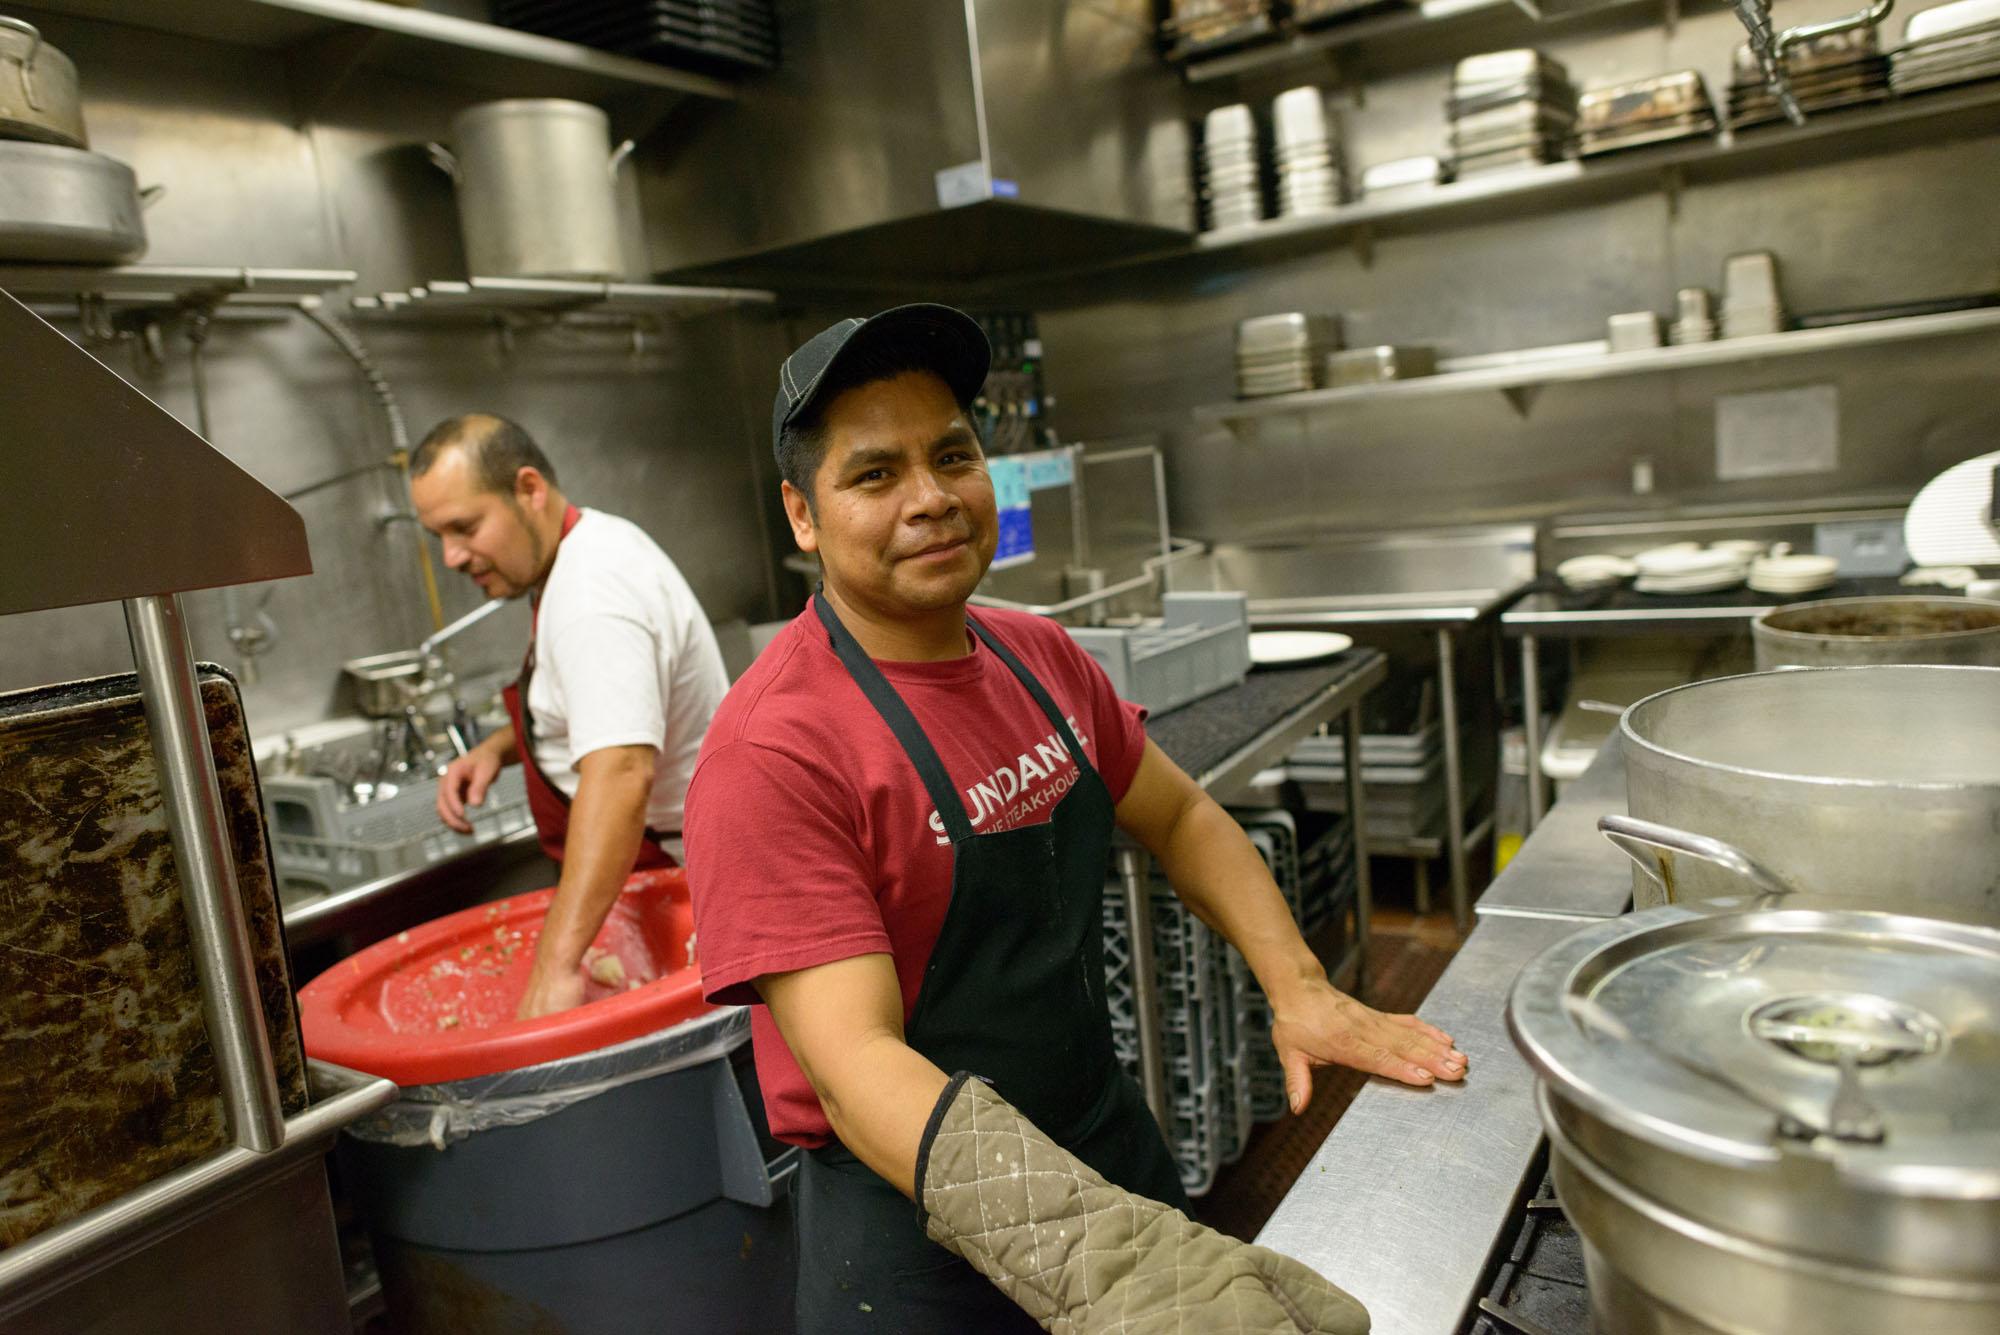 4259_d800b_Sundance_the_Steakhouse_Palo_Alto_Restaurant_Photography.jpg